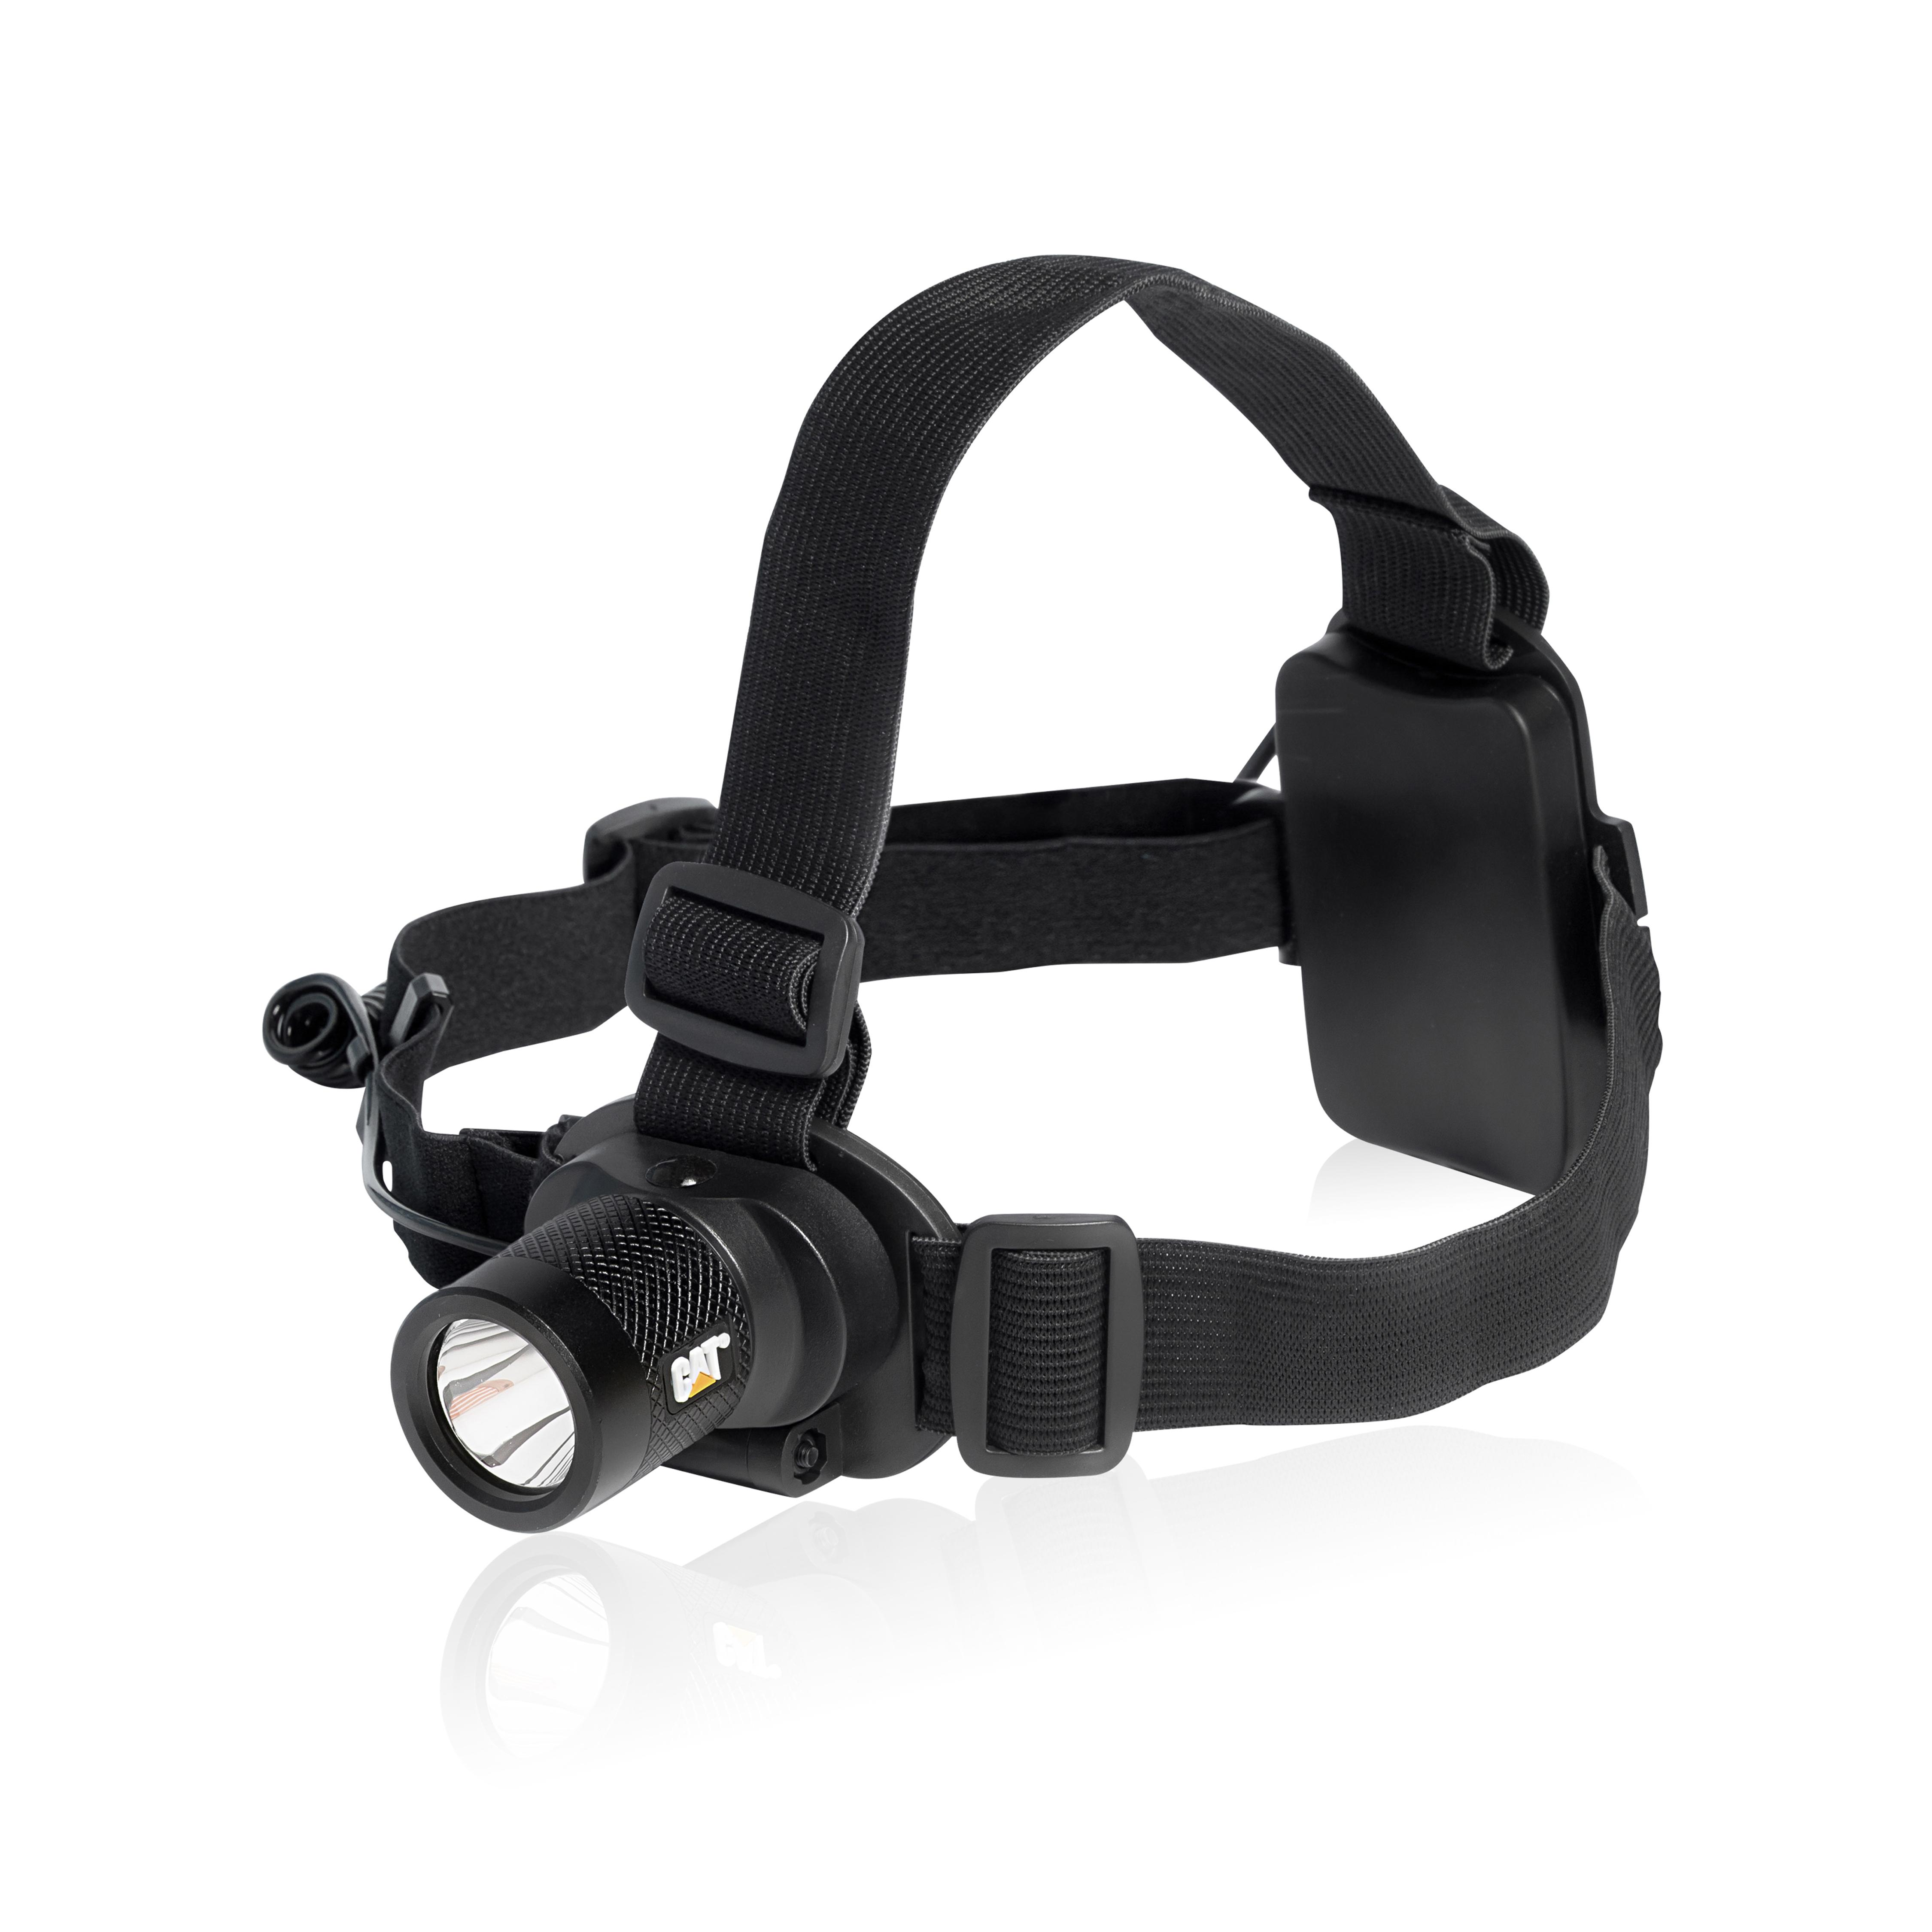 CAT CT40150P 120 Lumen, Battery Powered, 2 Mode LED Headlamp, Black